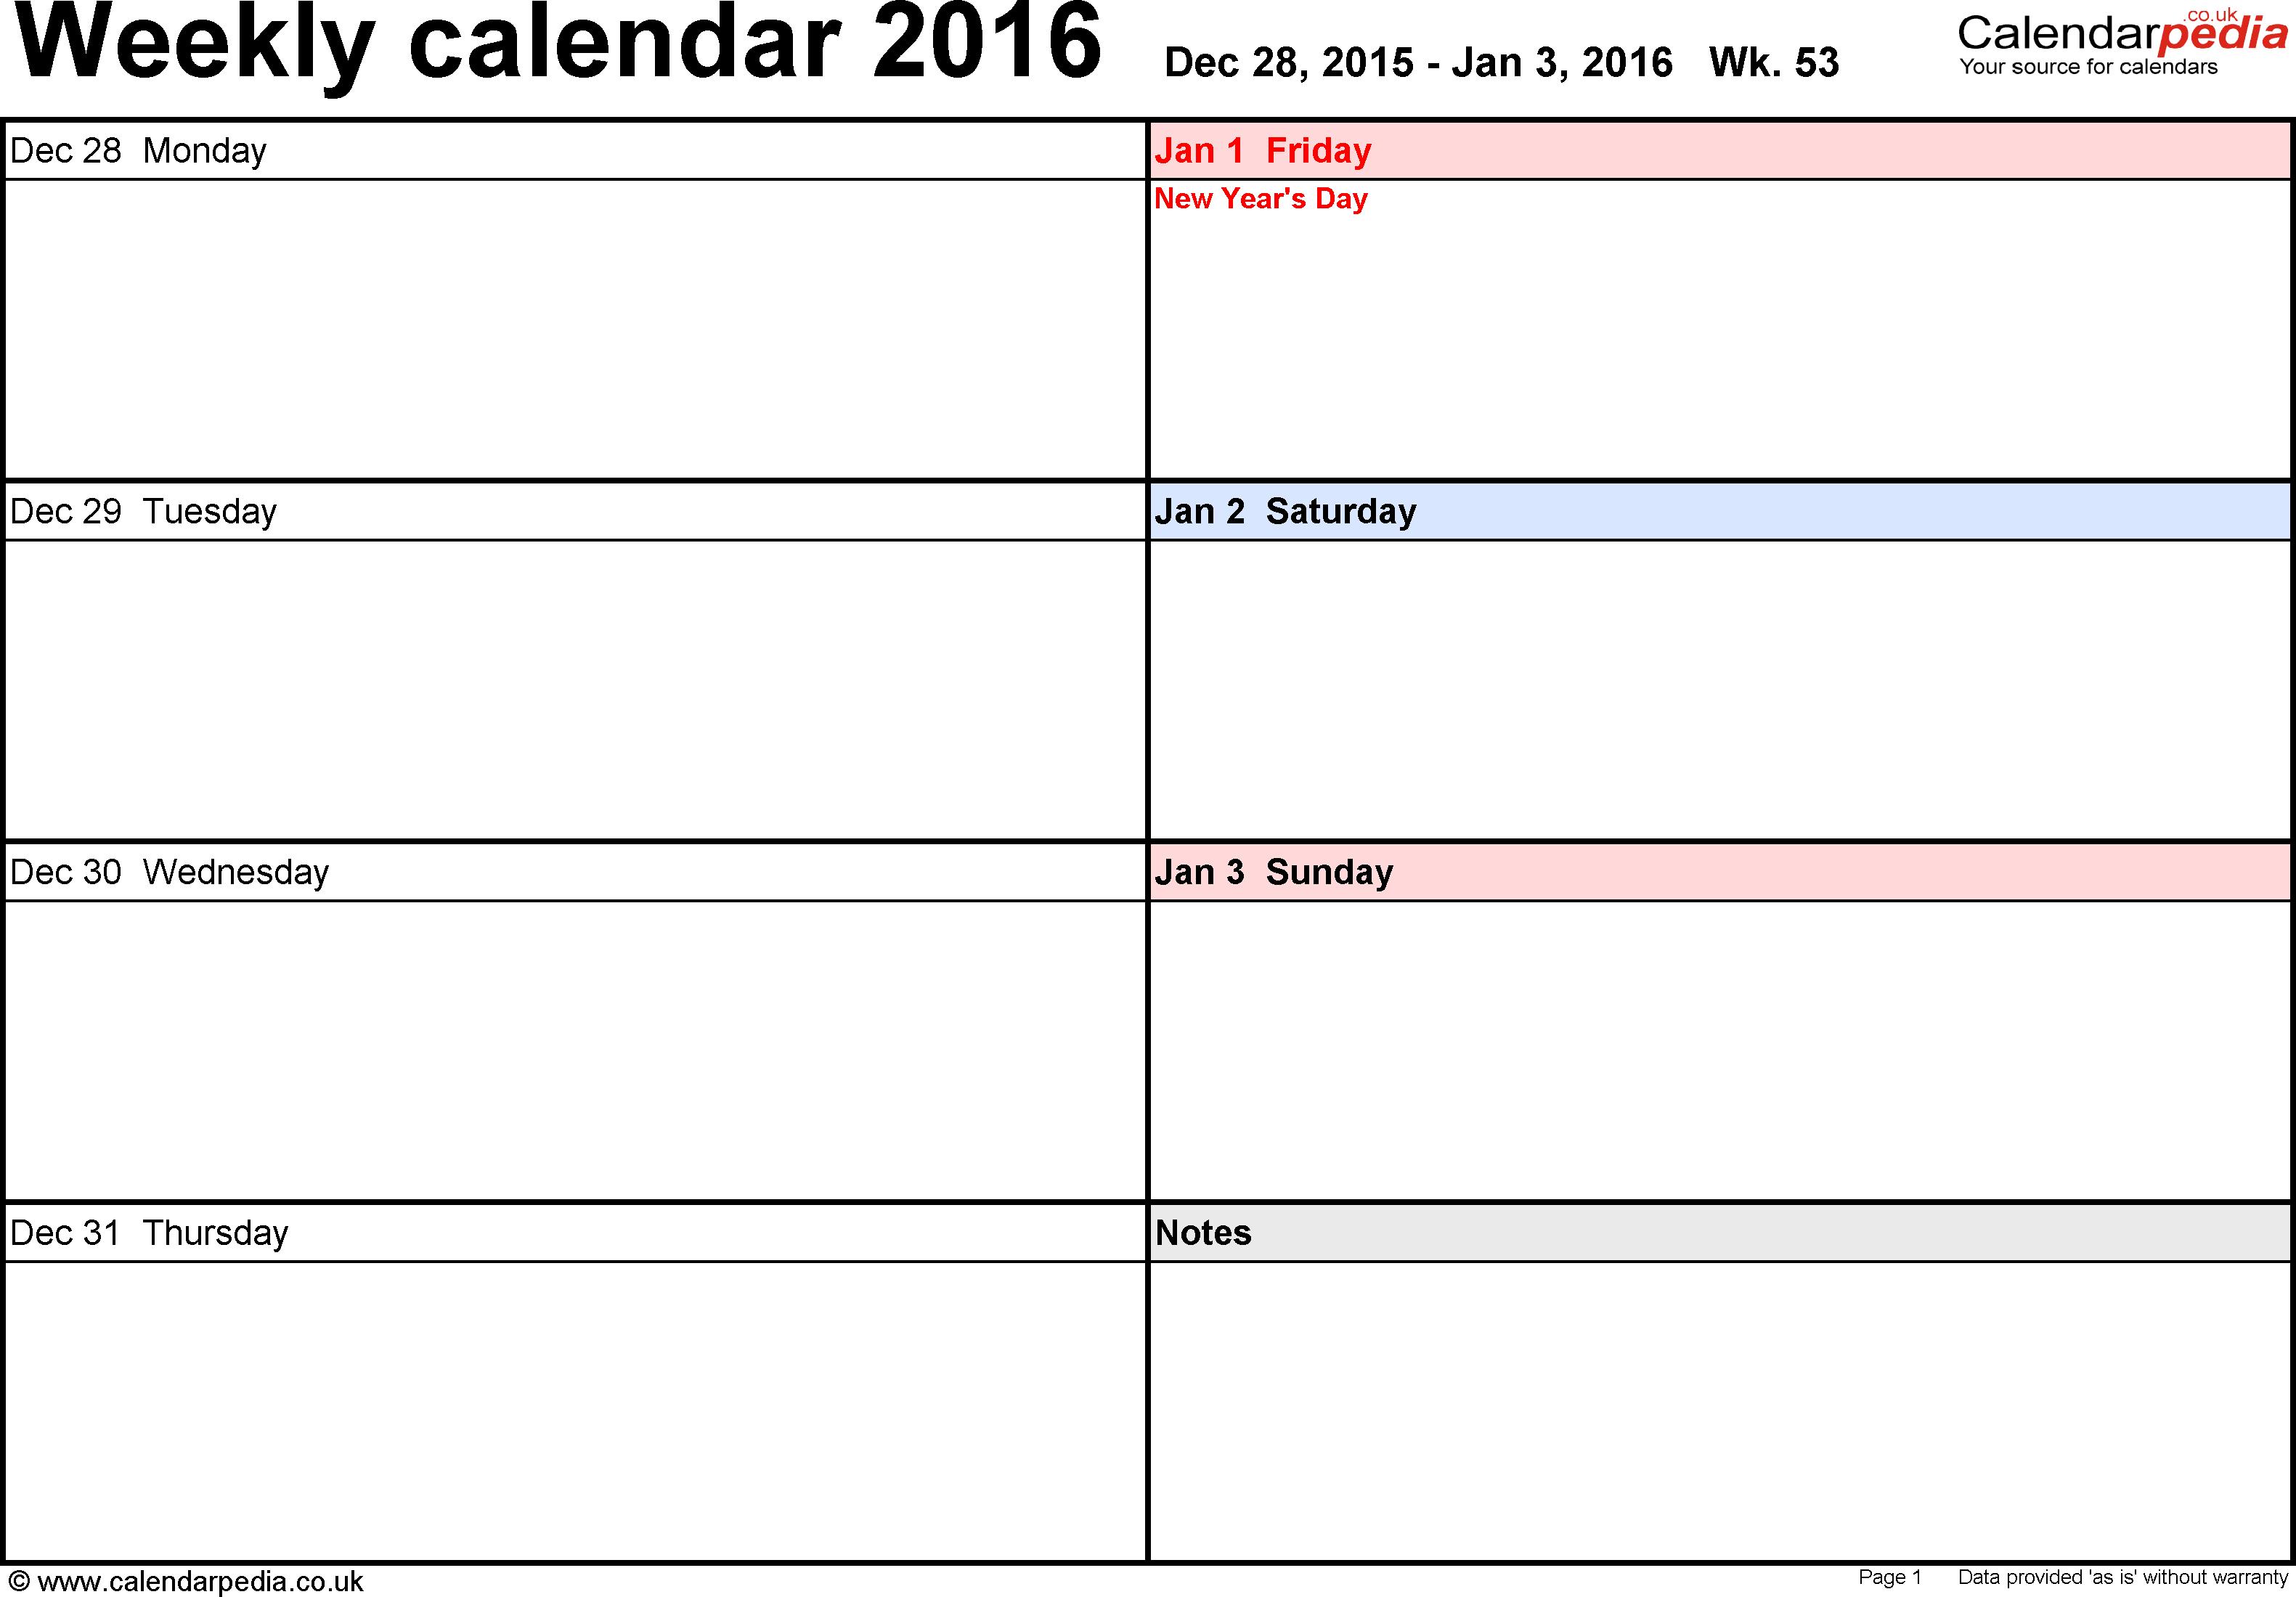 Weekly calendar 2016 UK - free printable templates for PDF